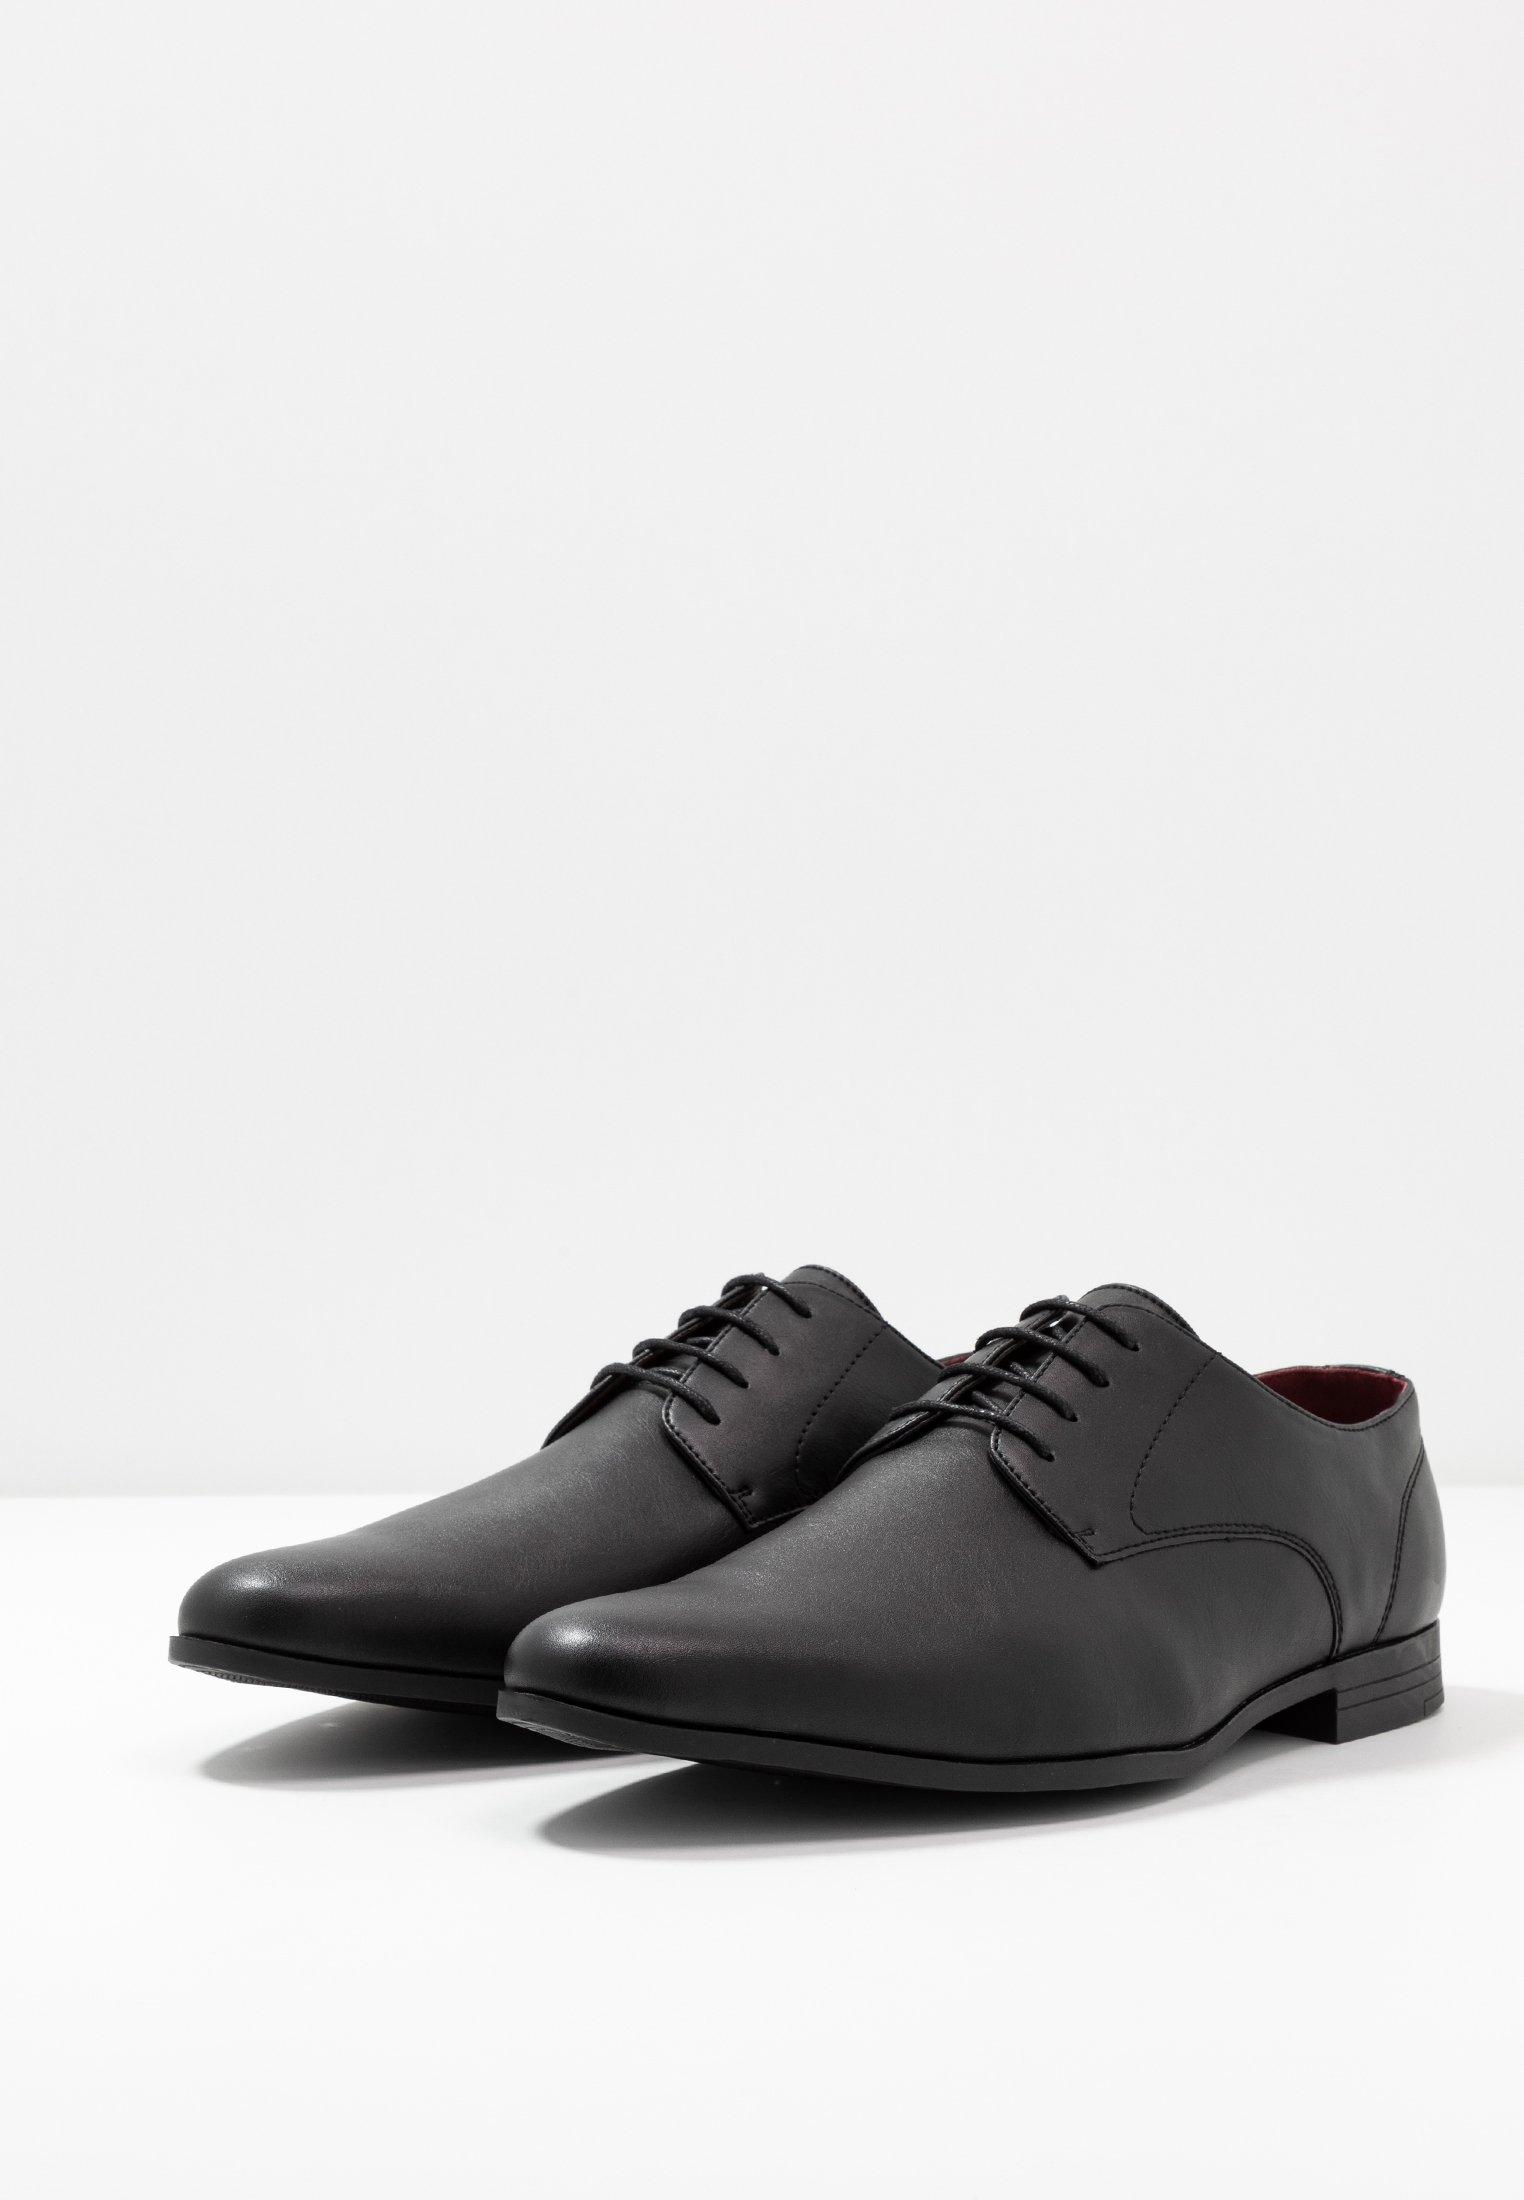 Burton Menswear London FREDDY - Eleganta snörskor - black/svart - Herrskor LNjcw